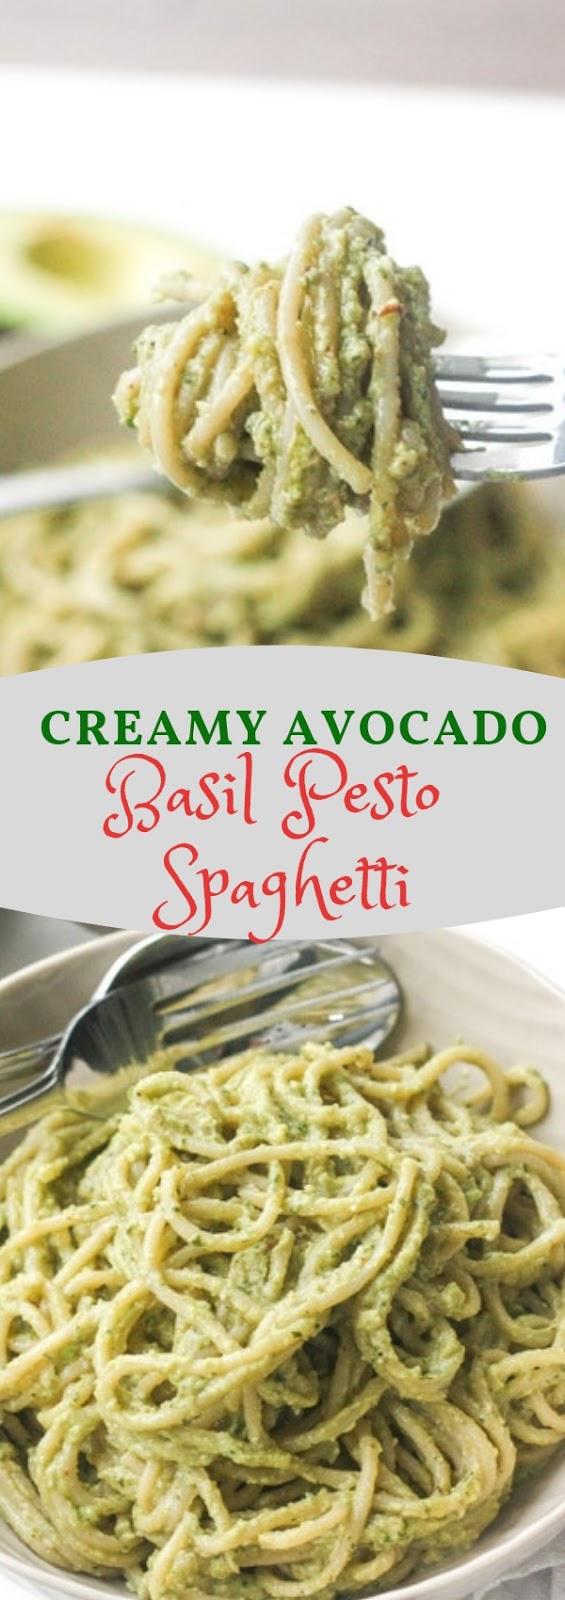 Creamy Avocado Basil Pesto Spaghetti  #dinner #creamy #avocdo #basil #spaghetti